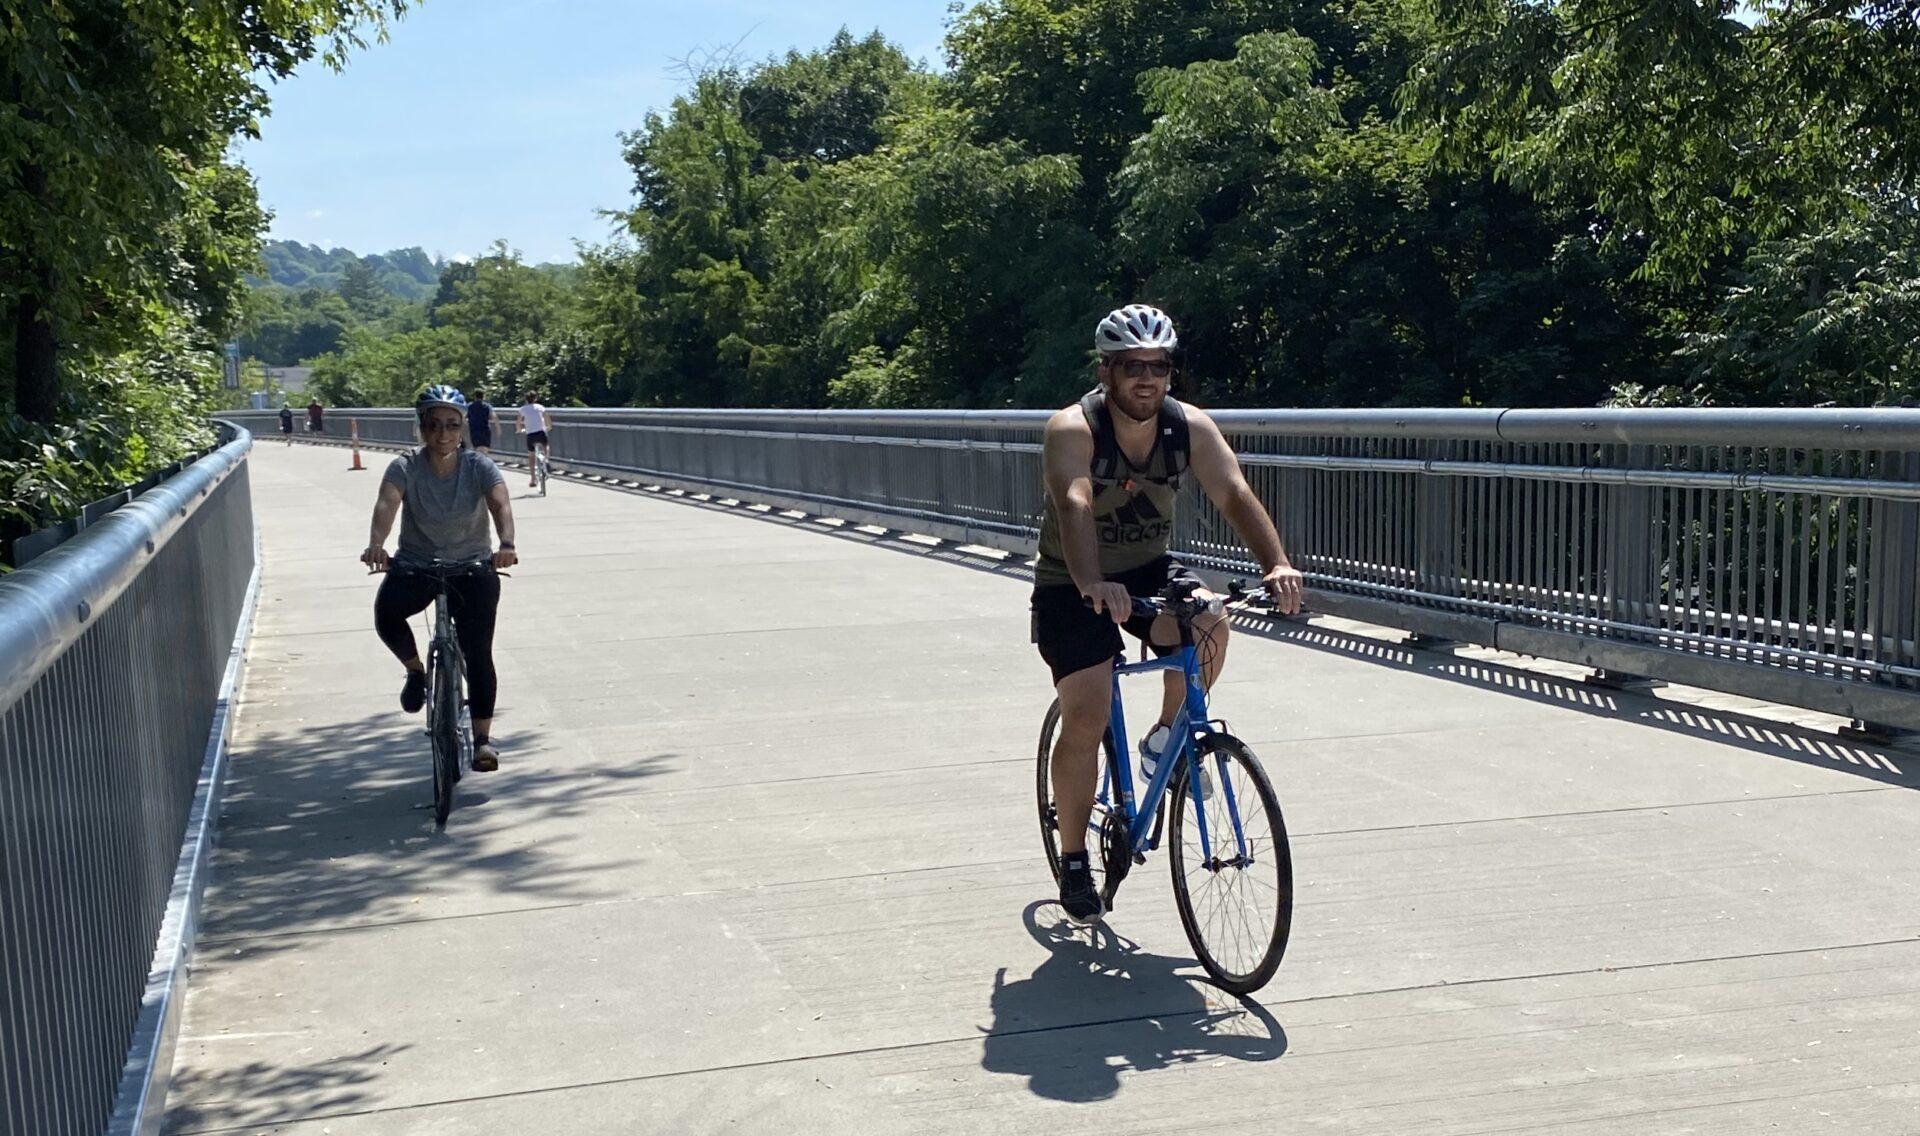 Biking on the Walkway Over the Hudson, Poughkeepsie, NY